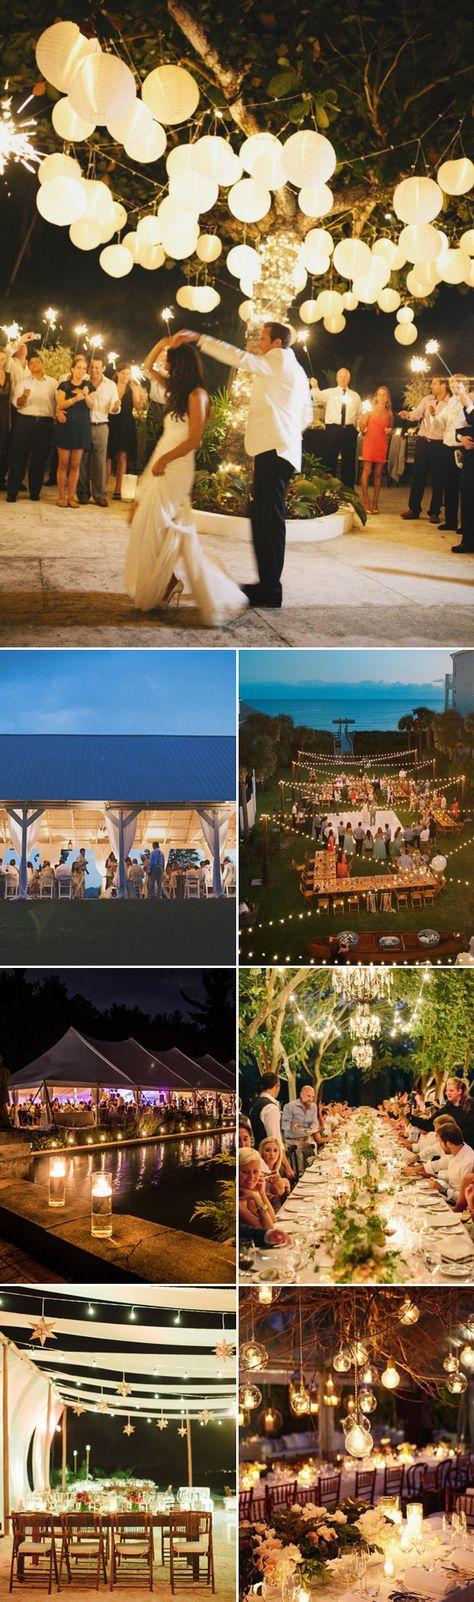 28 Beautiful Spring Outdoor Reception Decor Ideas - Night Reception